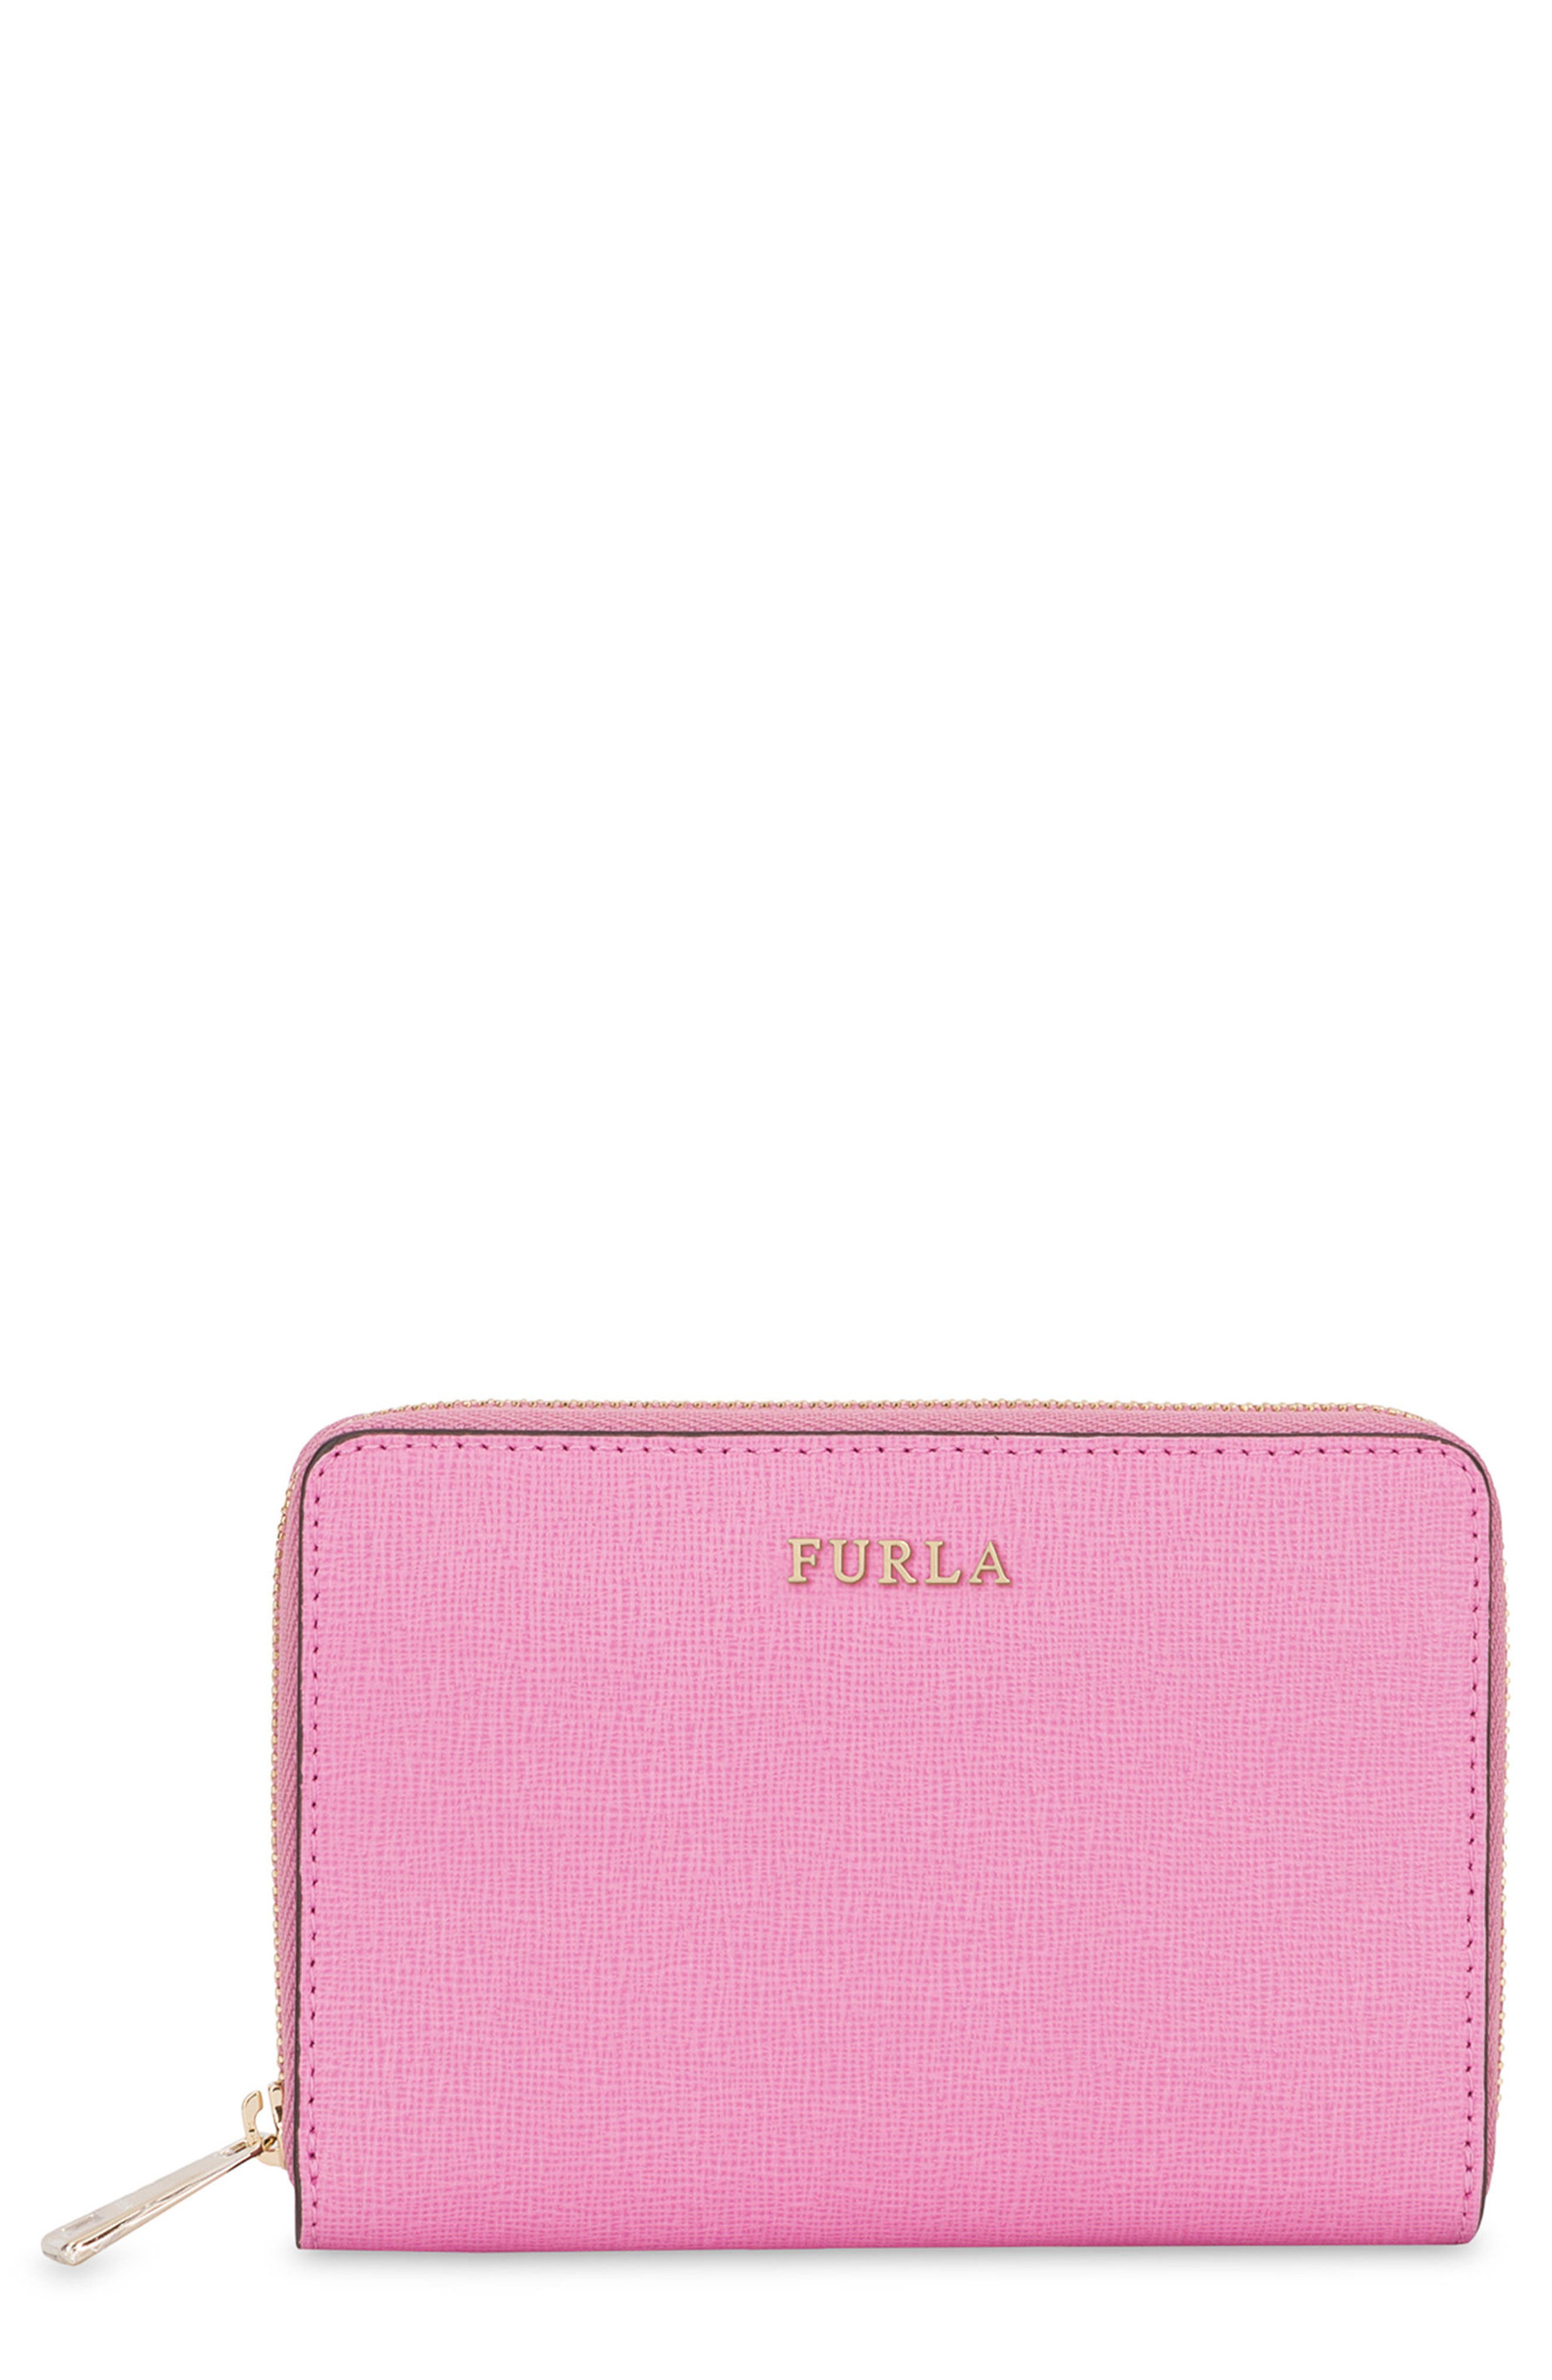 Medium Babylon Saffiano Leather Zip Around Wallet,                         Main,                         color, Orchidea